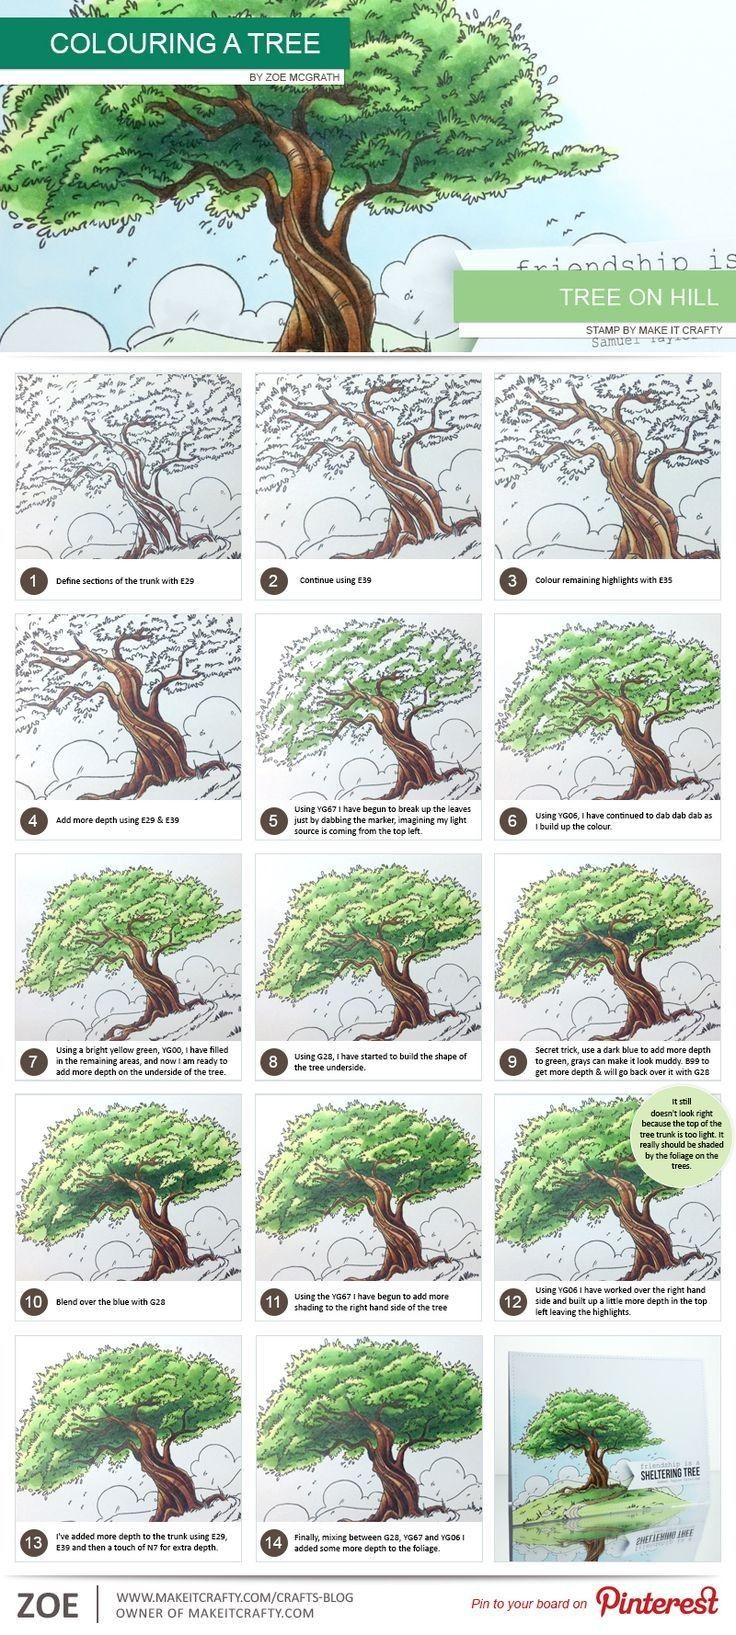 Colorir Arvore Tree Drawings Pencil Tree Drawing Color Pencil Art